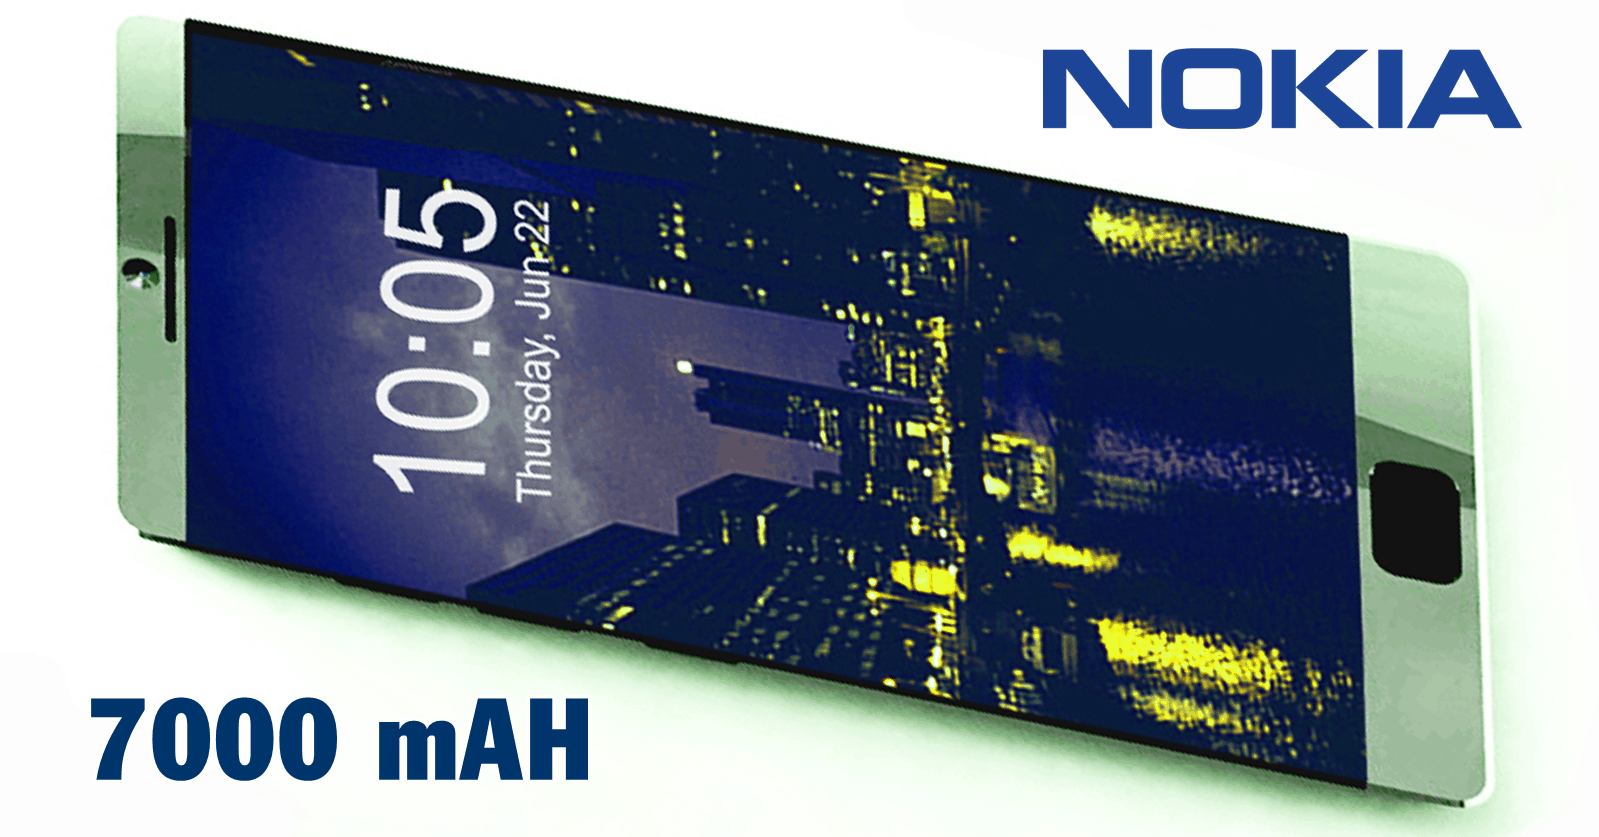 Nokia Note Max 2019 10gb Ram 42mp 7000mah Battery More